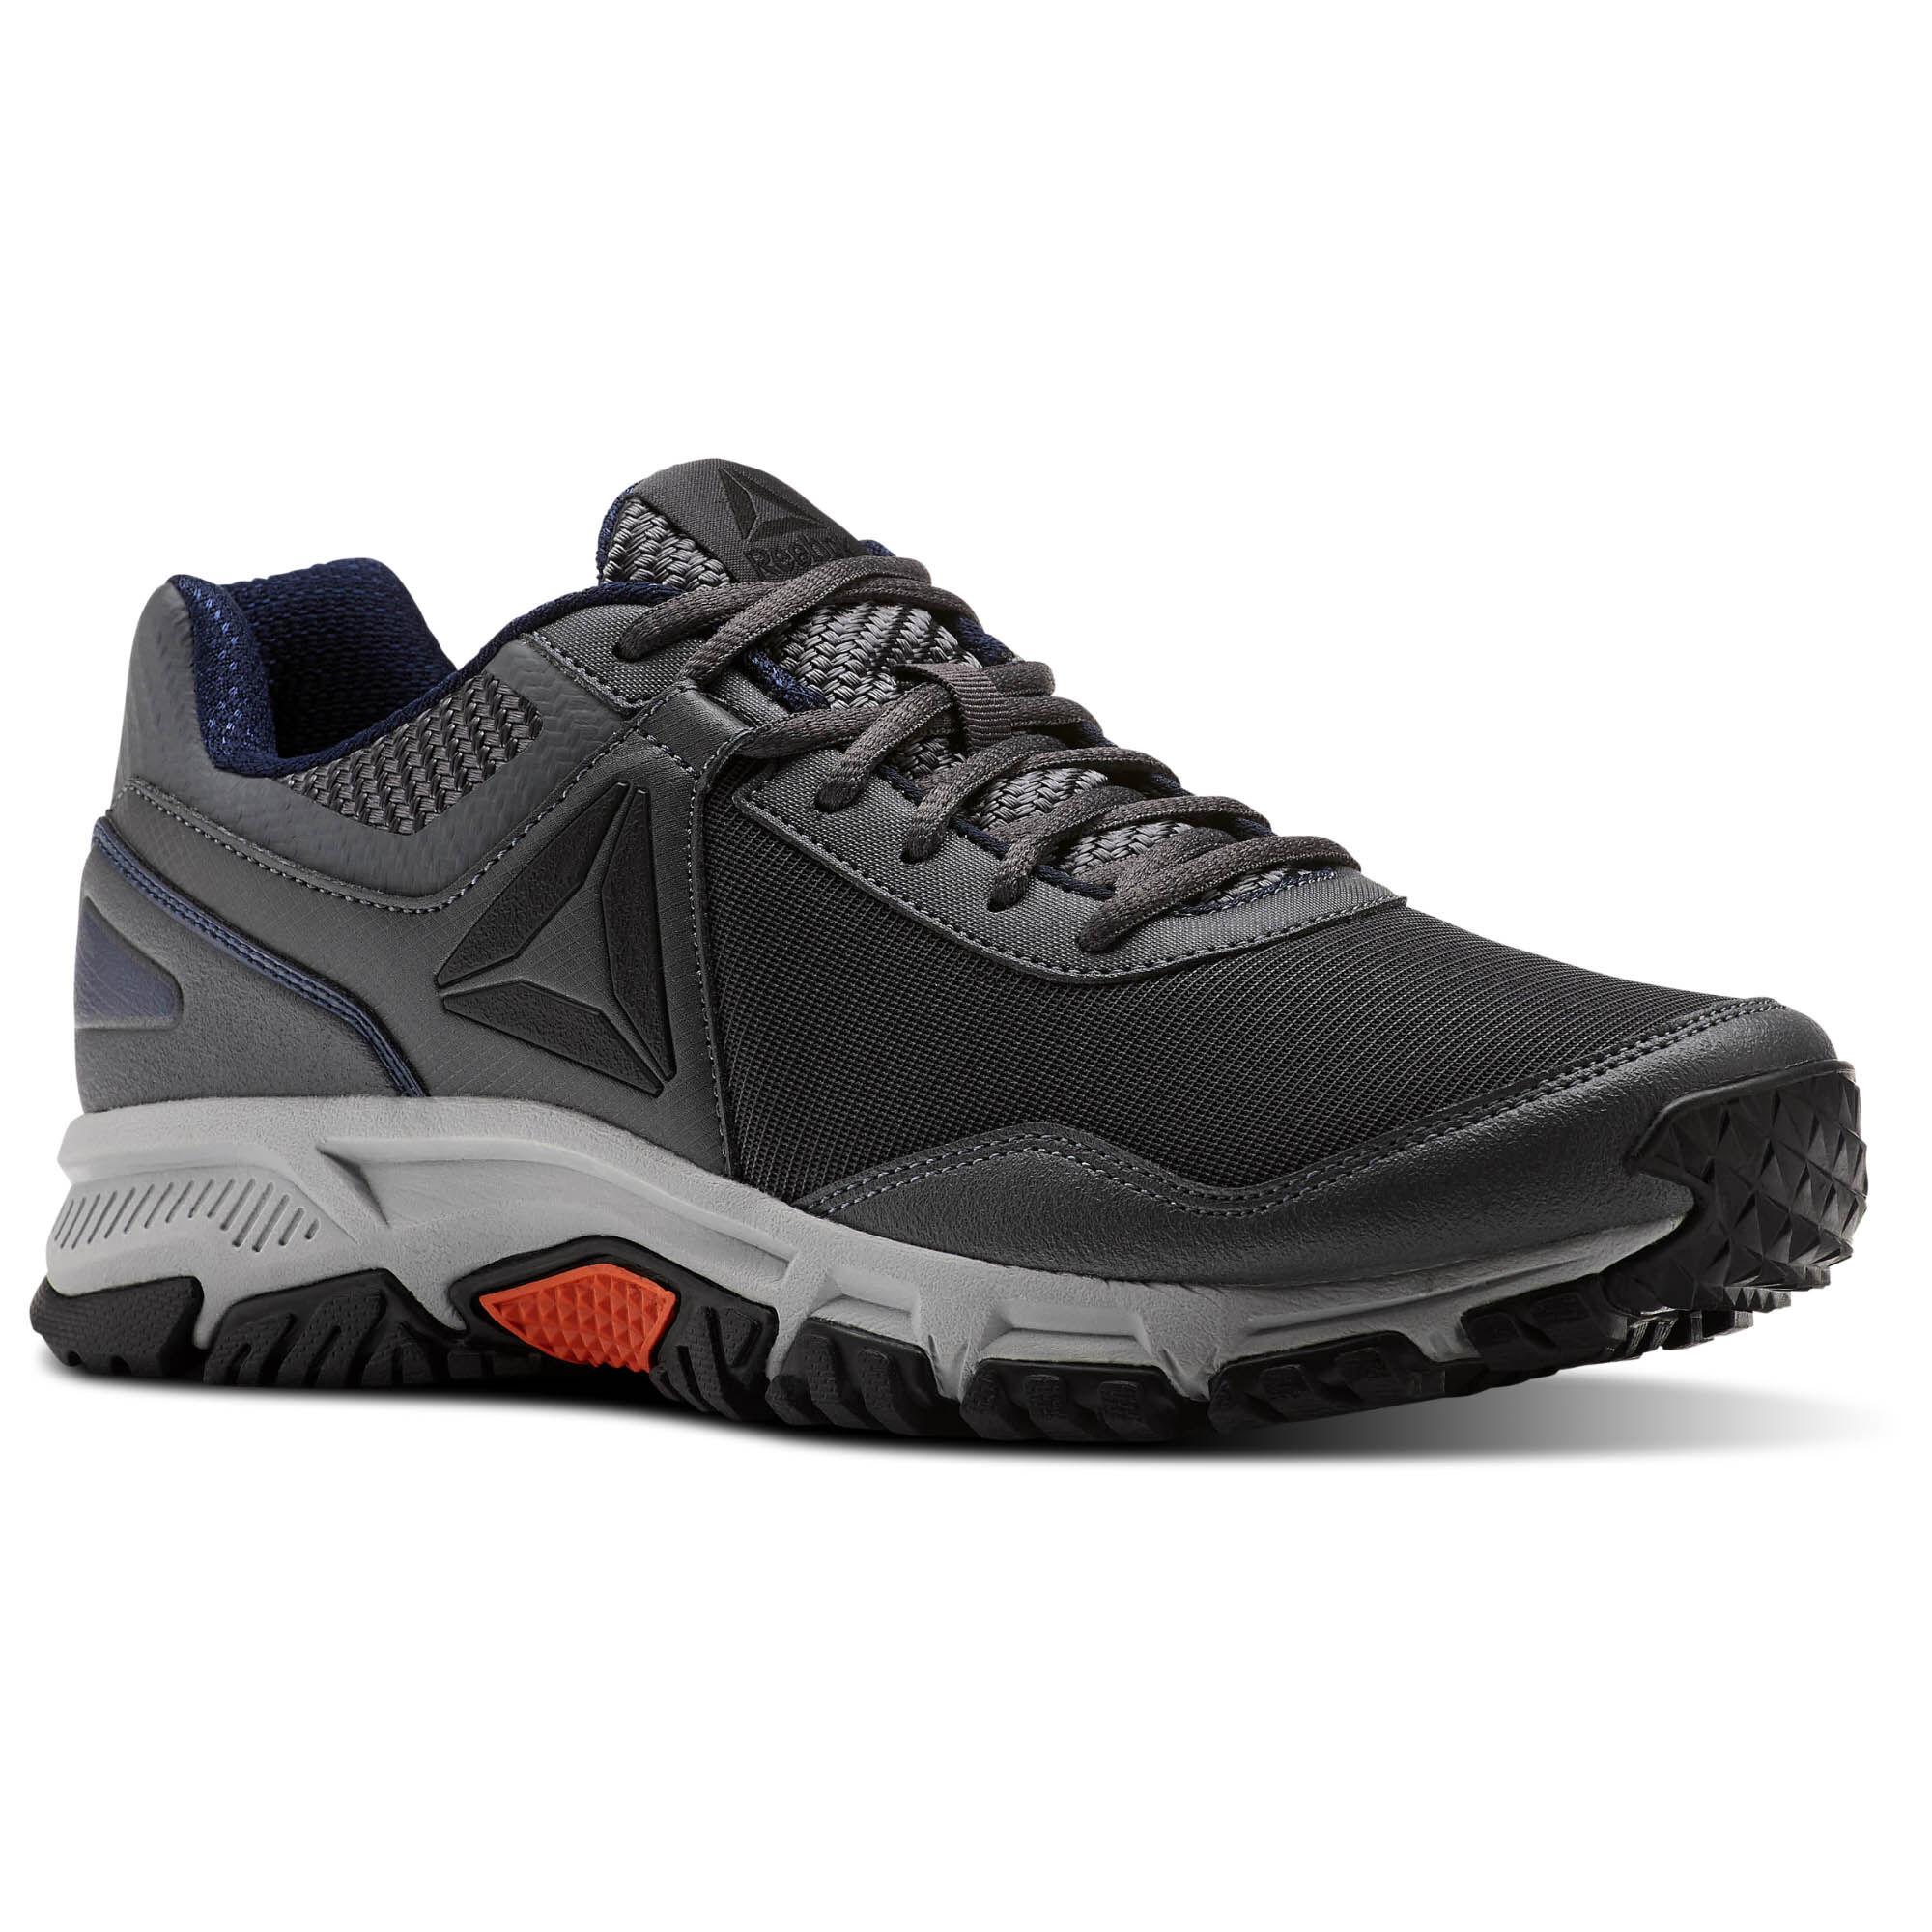 Reebok RIDGERIDER TRAIL 3.0 - Trail running shoes - grey/navy/bright lava H86pkN2dTD